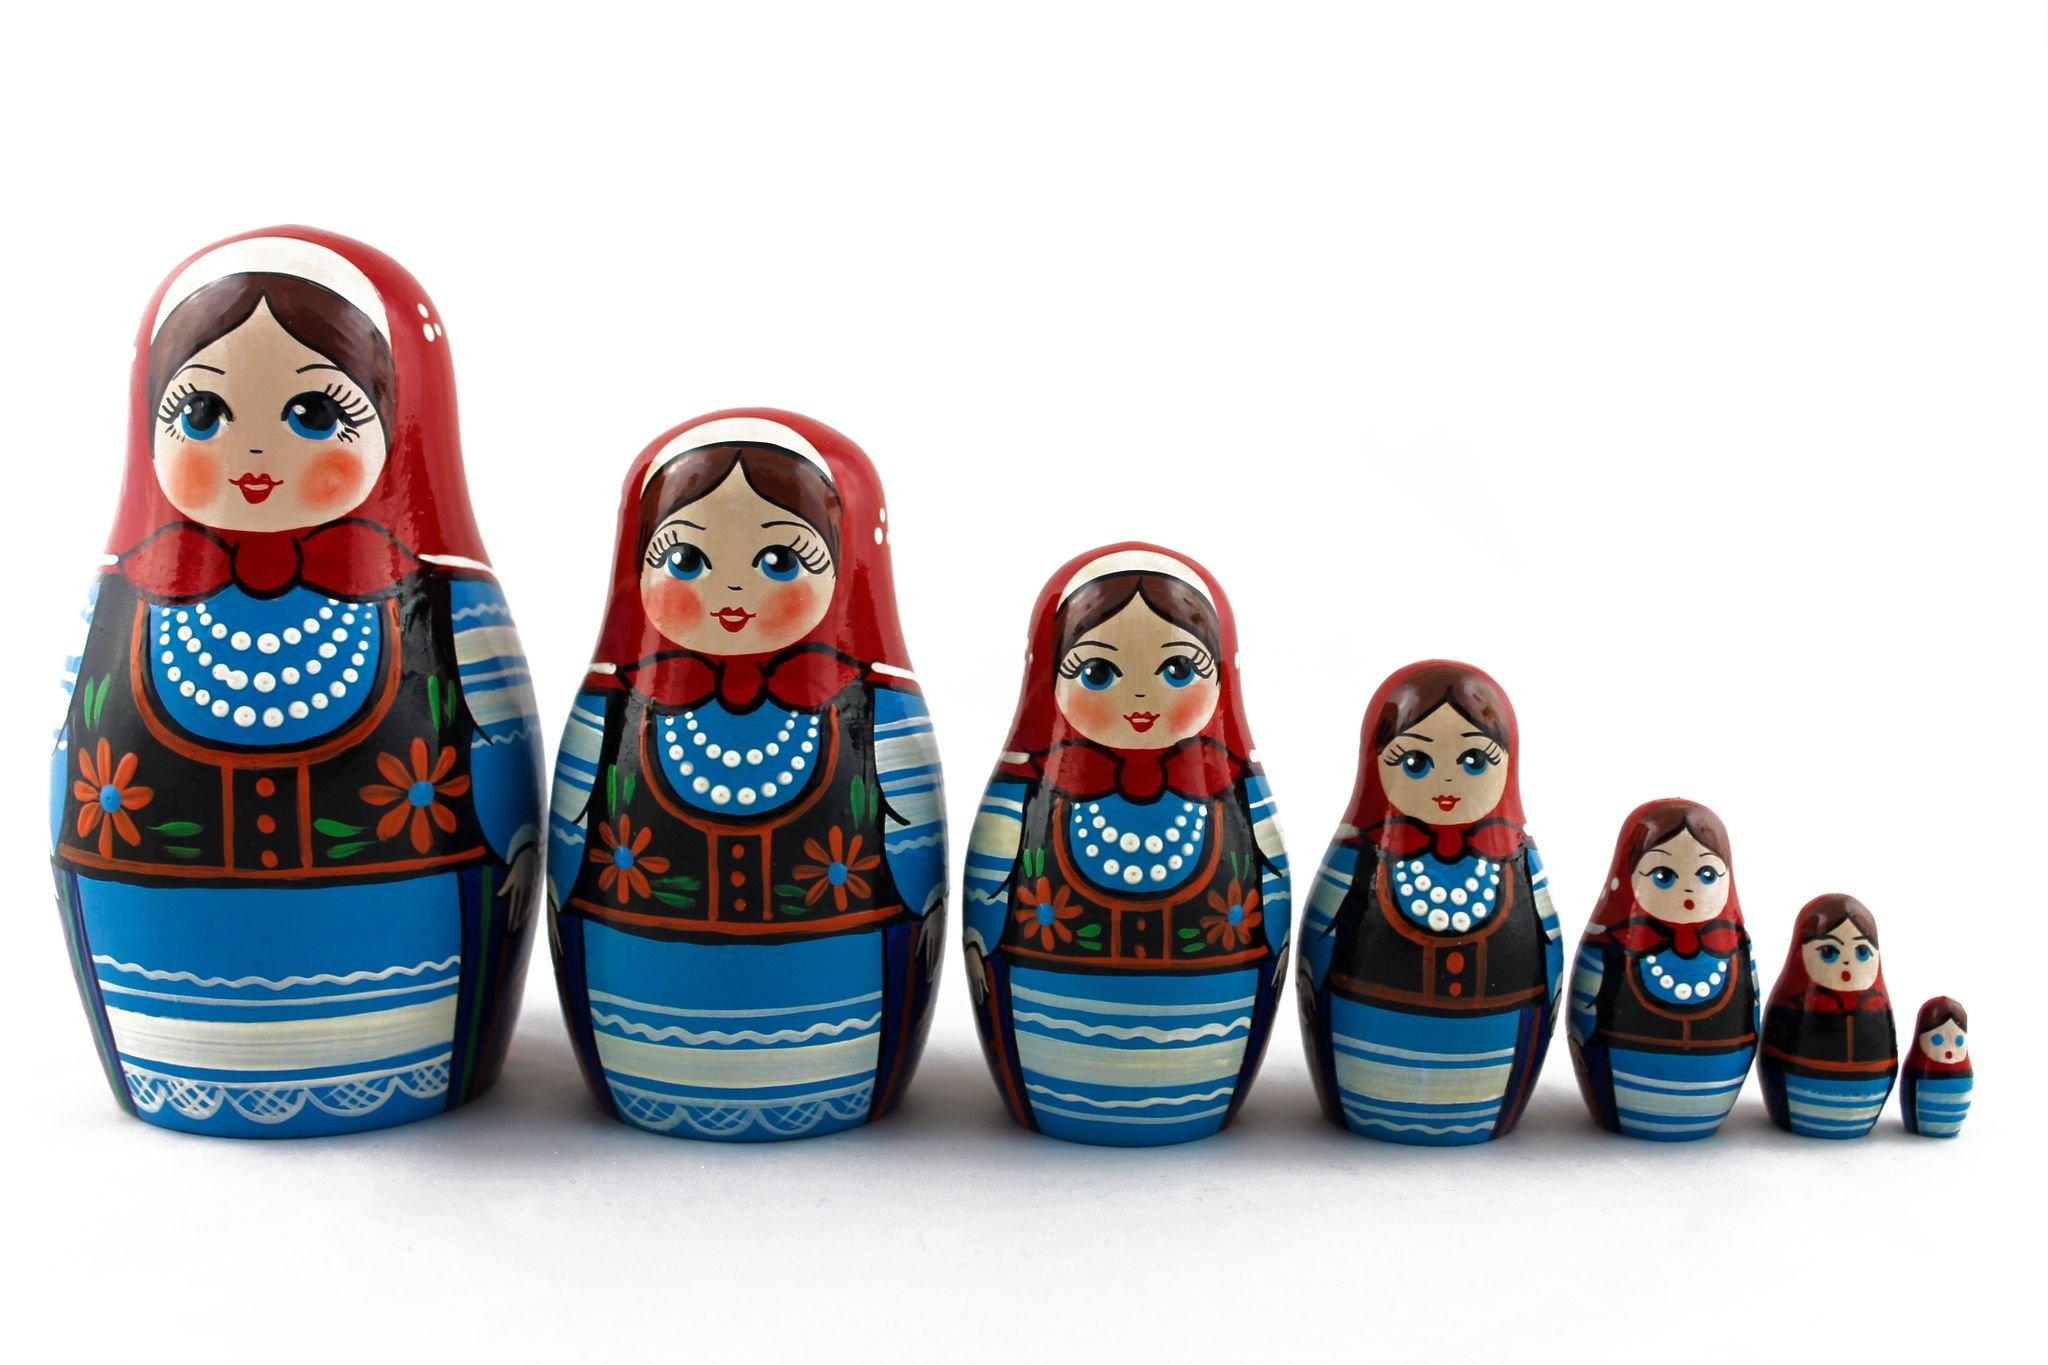 Matryoshka Polish National Dress Babushka Russian Nesting Wooden Stacking Doll 7 Pcs by MATRYOSHKA&HANDICRAFT (Image #9)